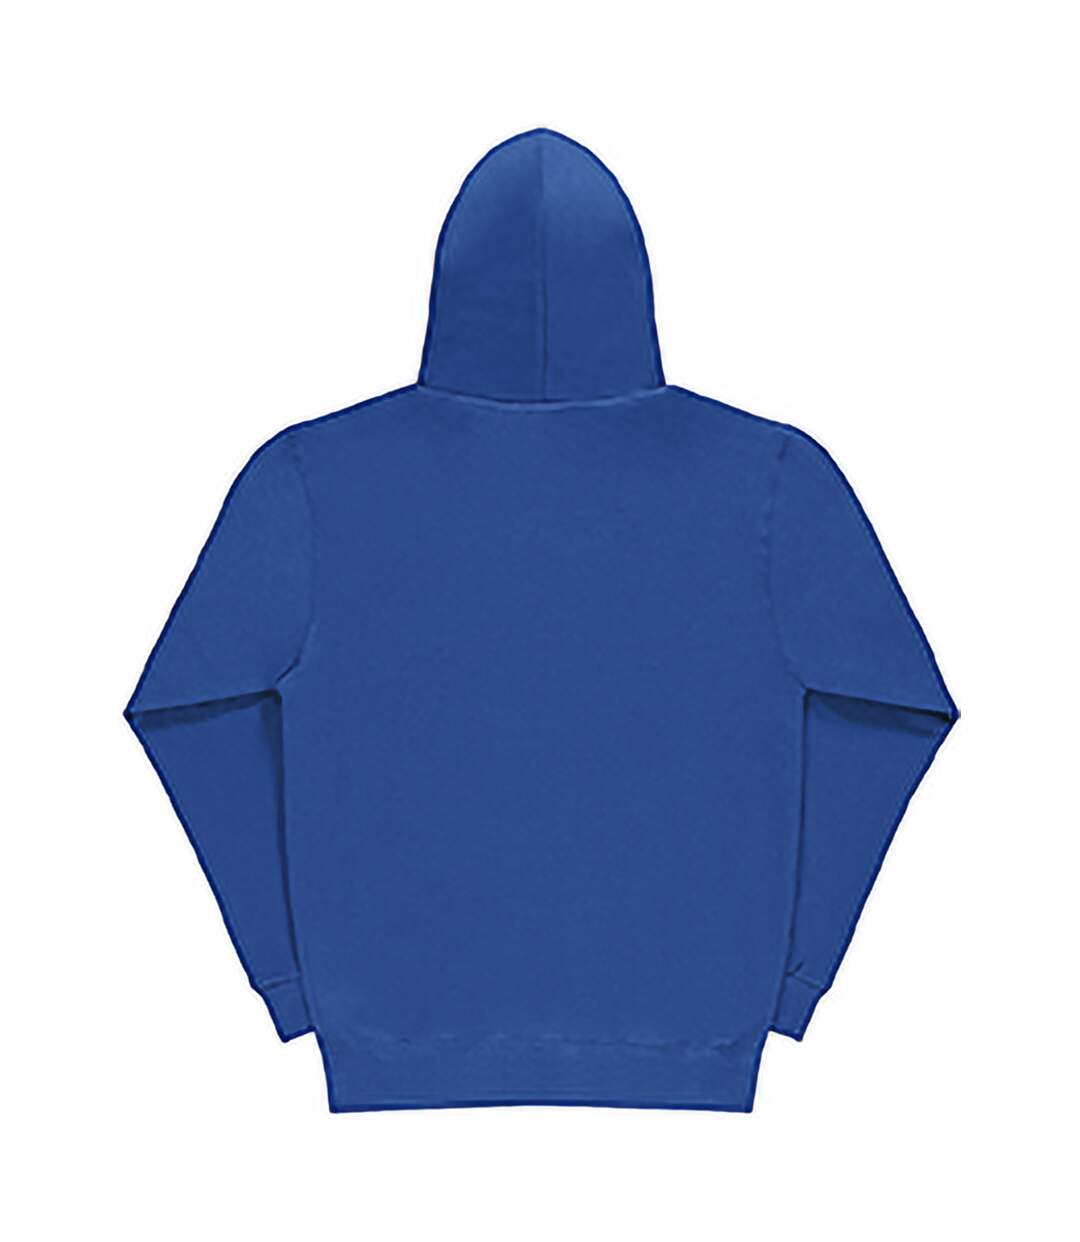 SG Mens Plain Hooded Sweatshirt Top / Hoodie (Royal) - UTBC1072